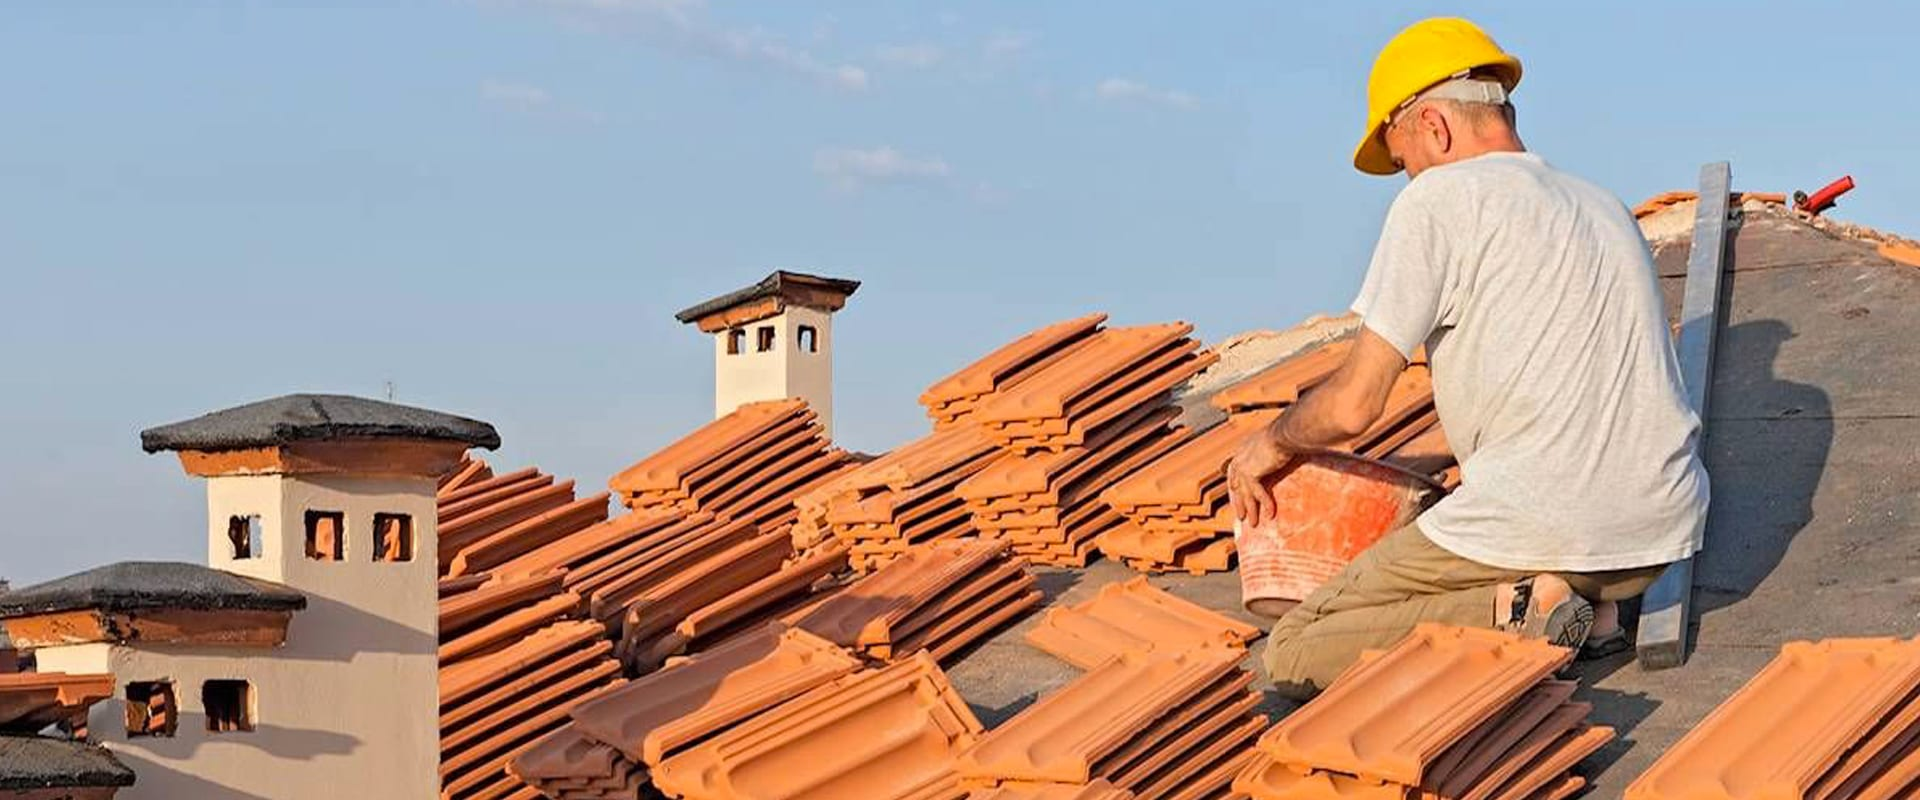 Roof leak experts Sydney